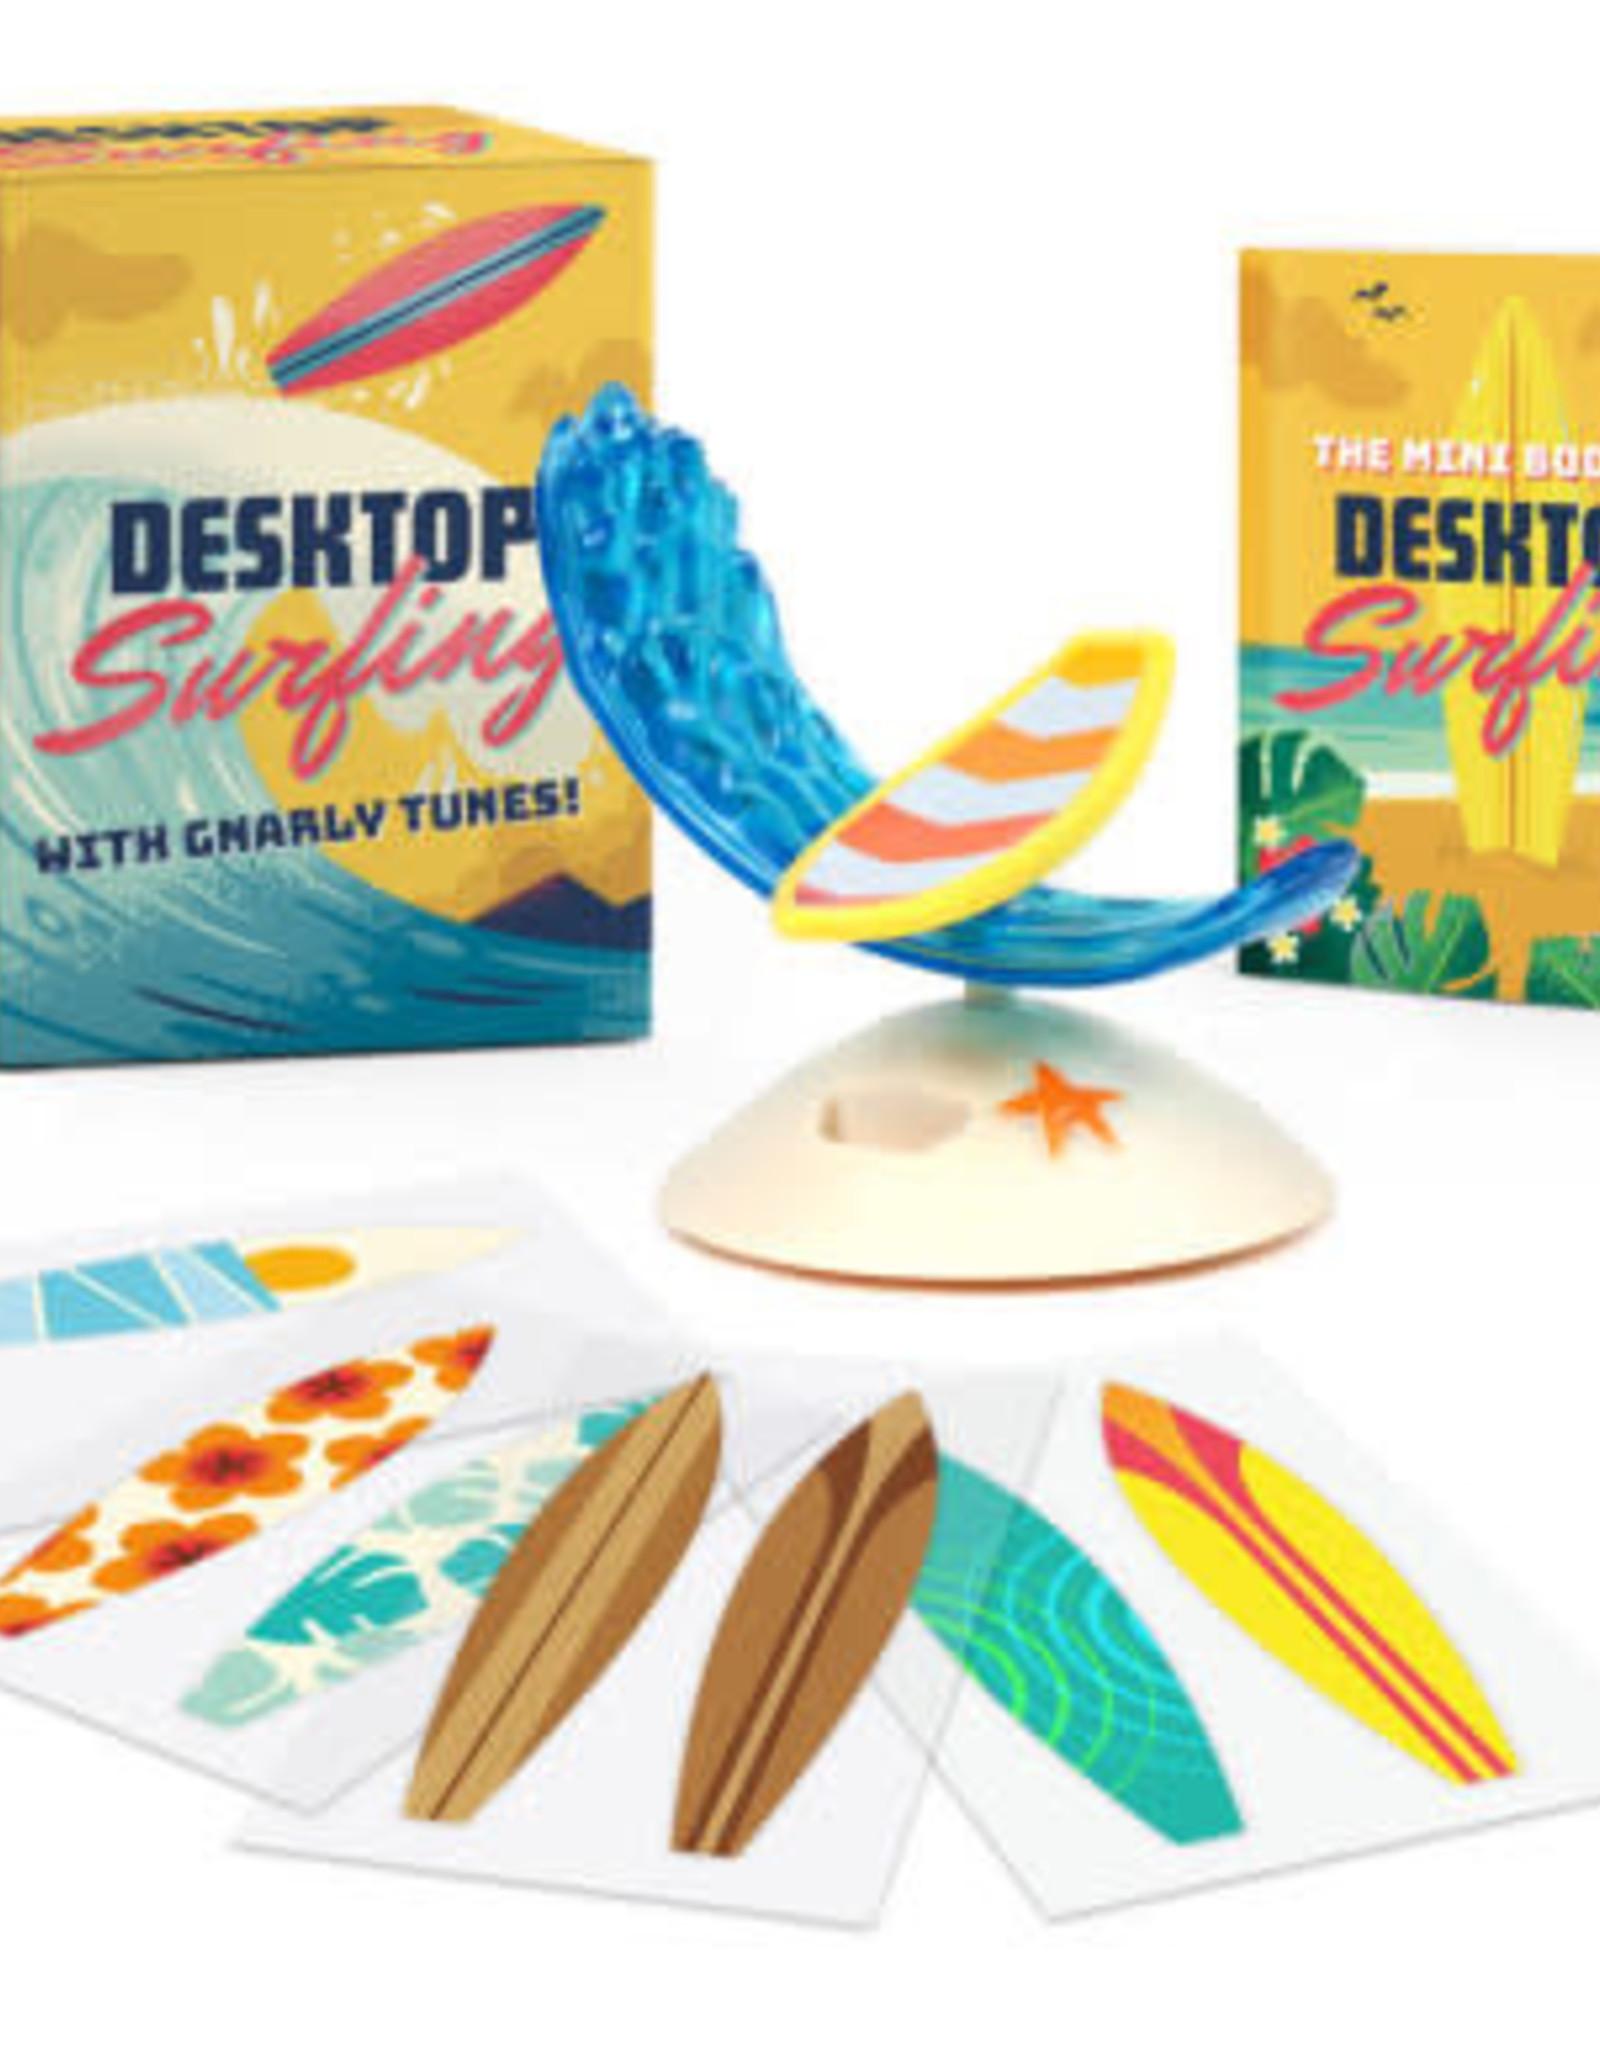 Hachette Mini Kit Desktop Surfing